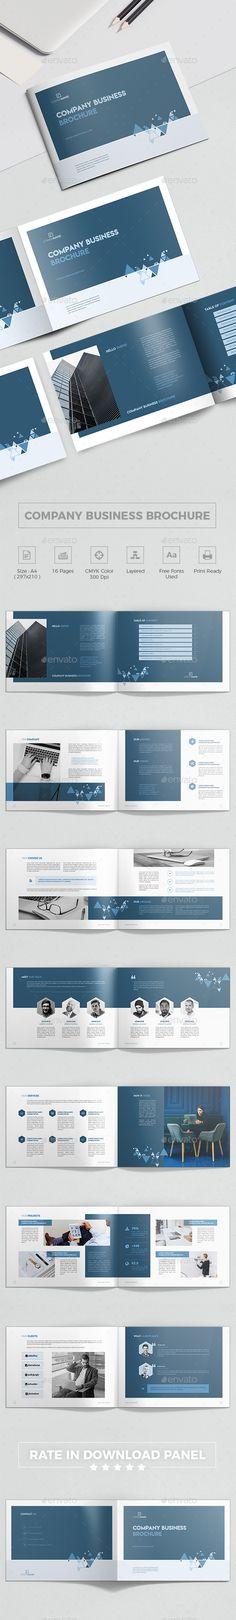 #Company Business Landscape Brochure - #Corporate #Brochures